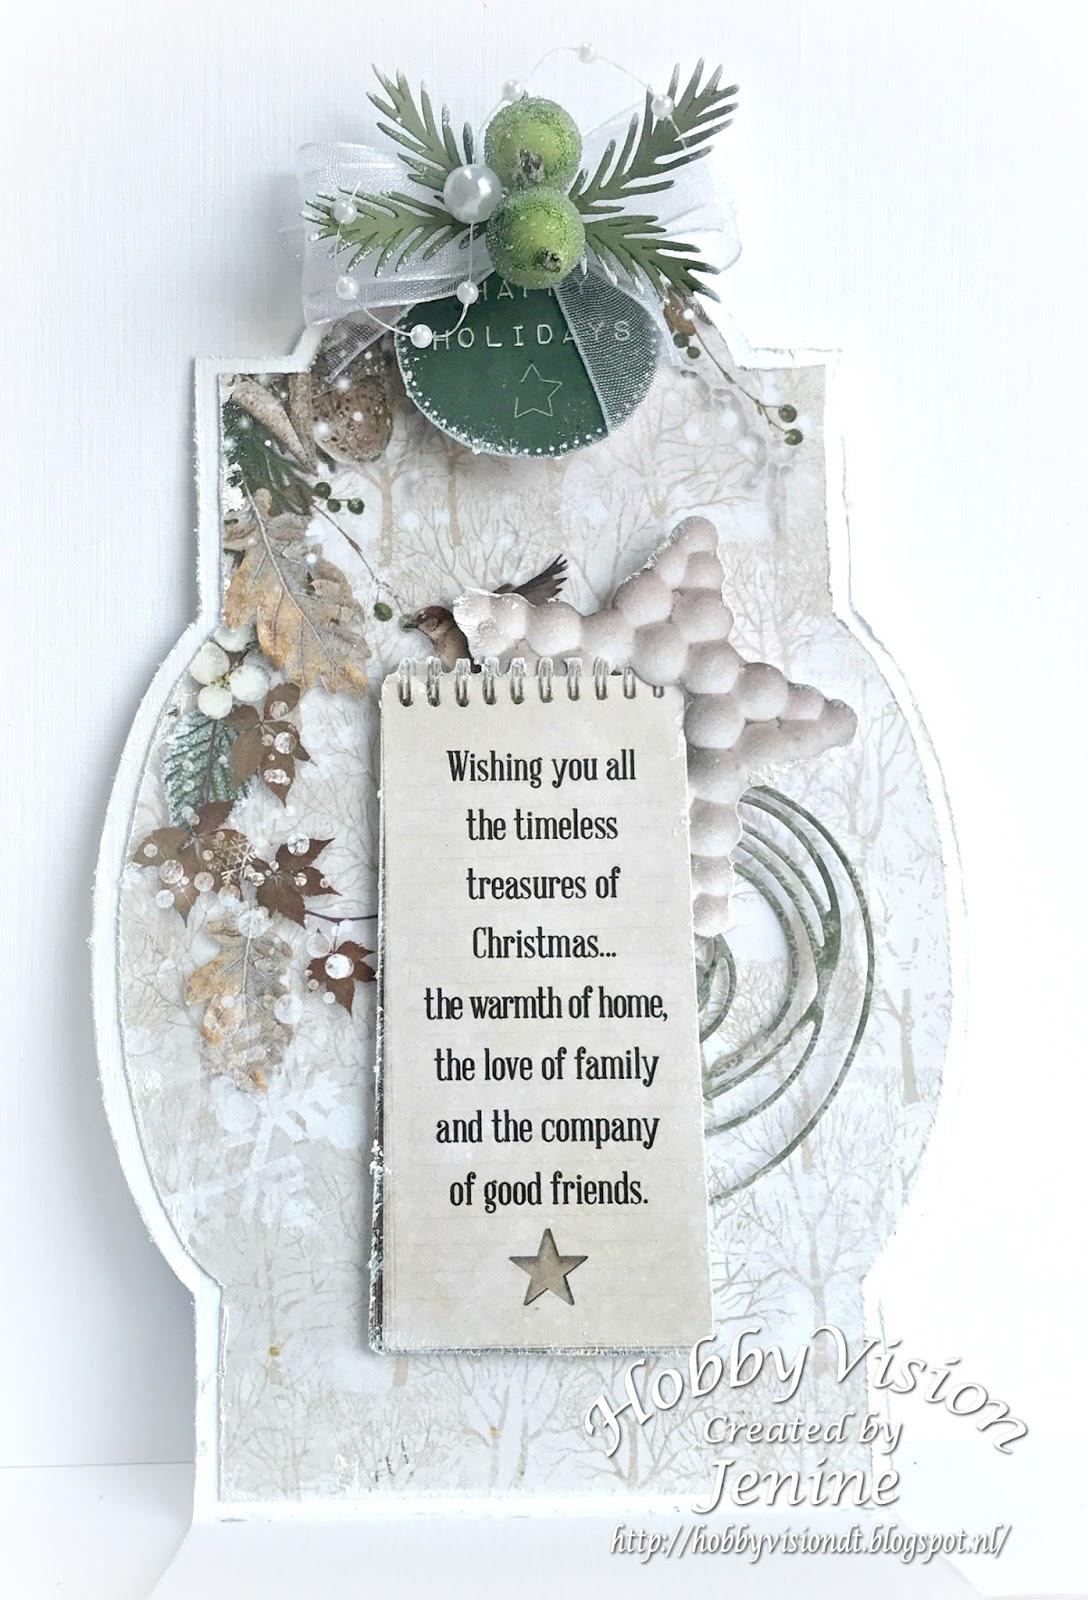 Jenine Siemerink: Wishing you all the timeless treasures of Christmas